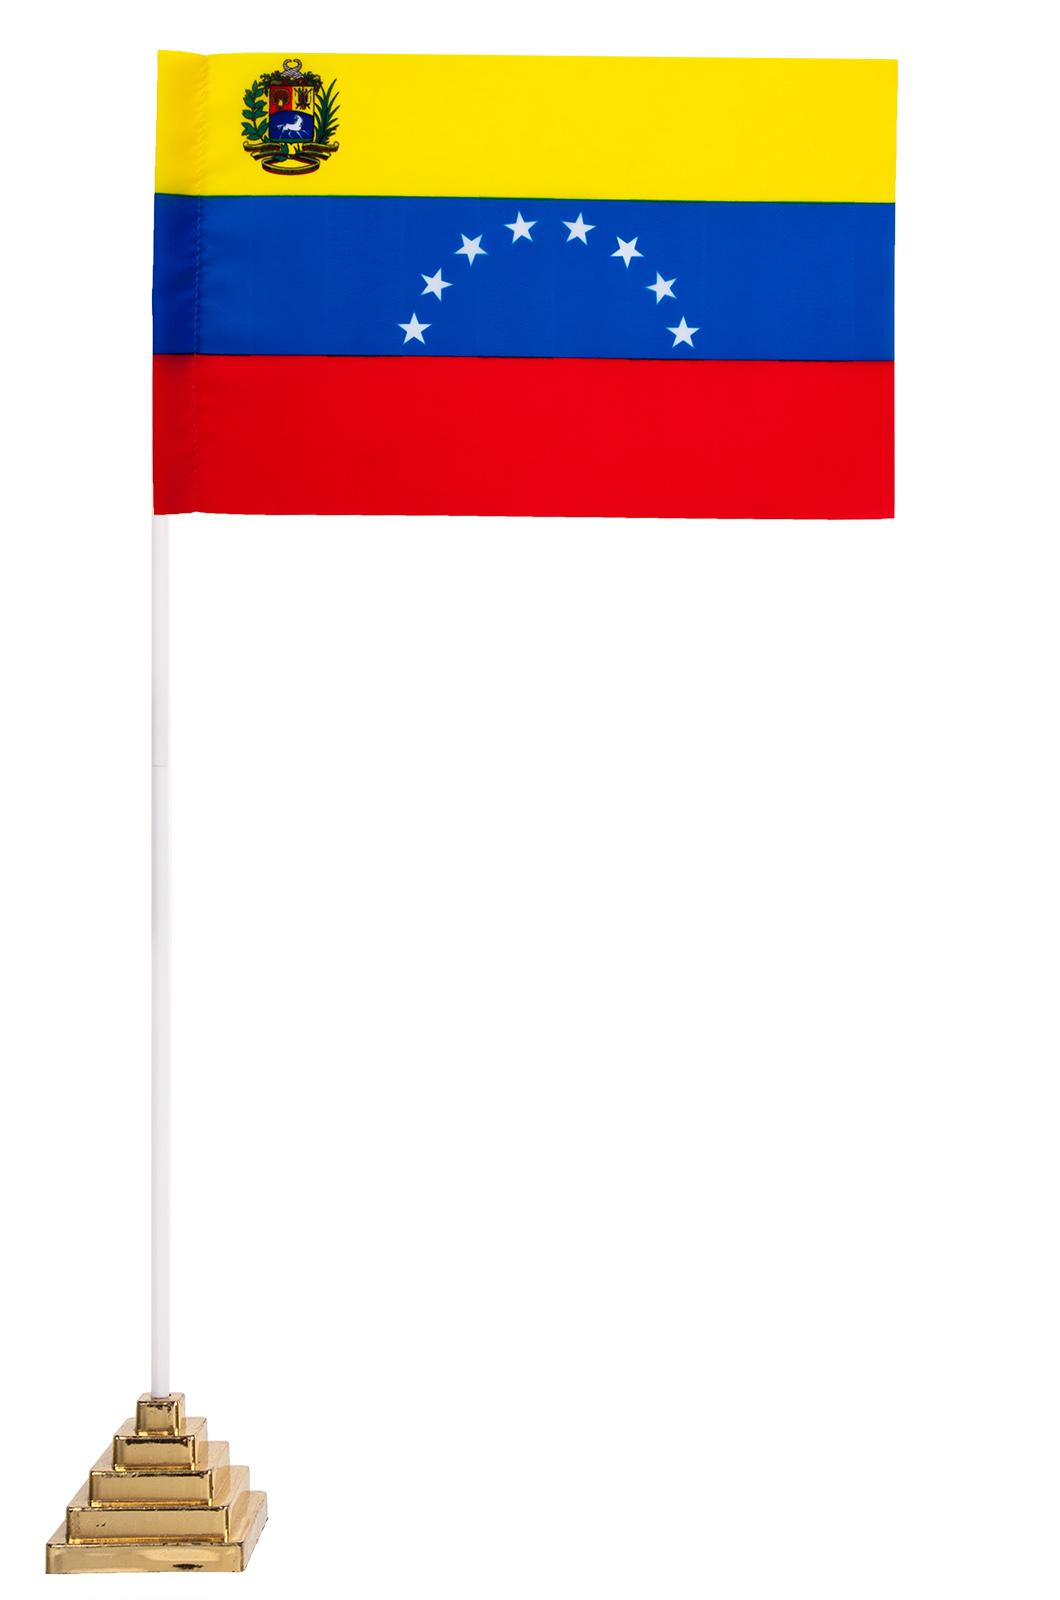 Настольный флаг Венесуэлы